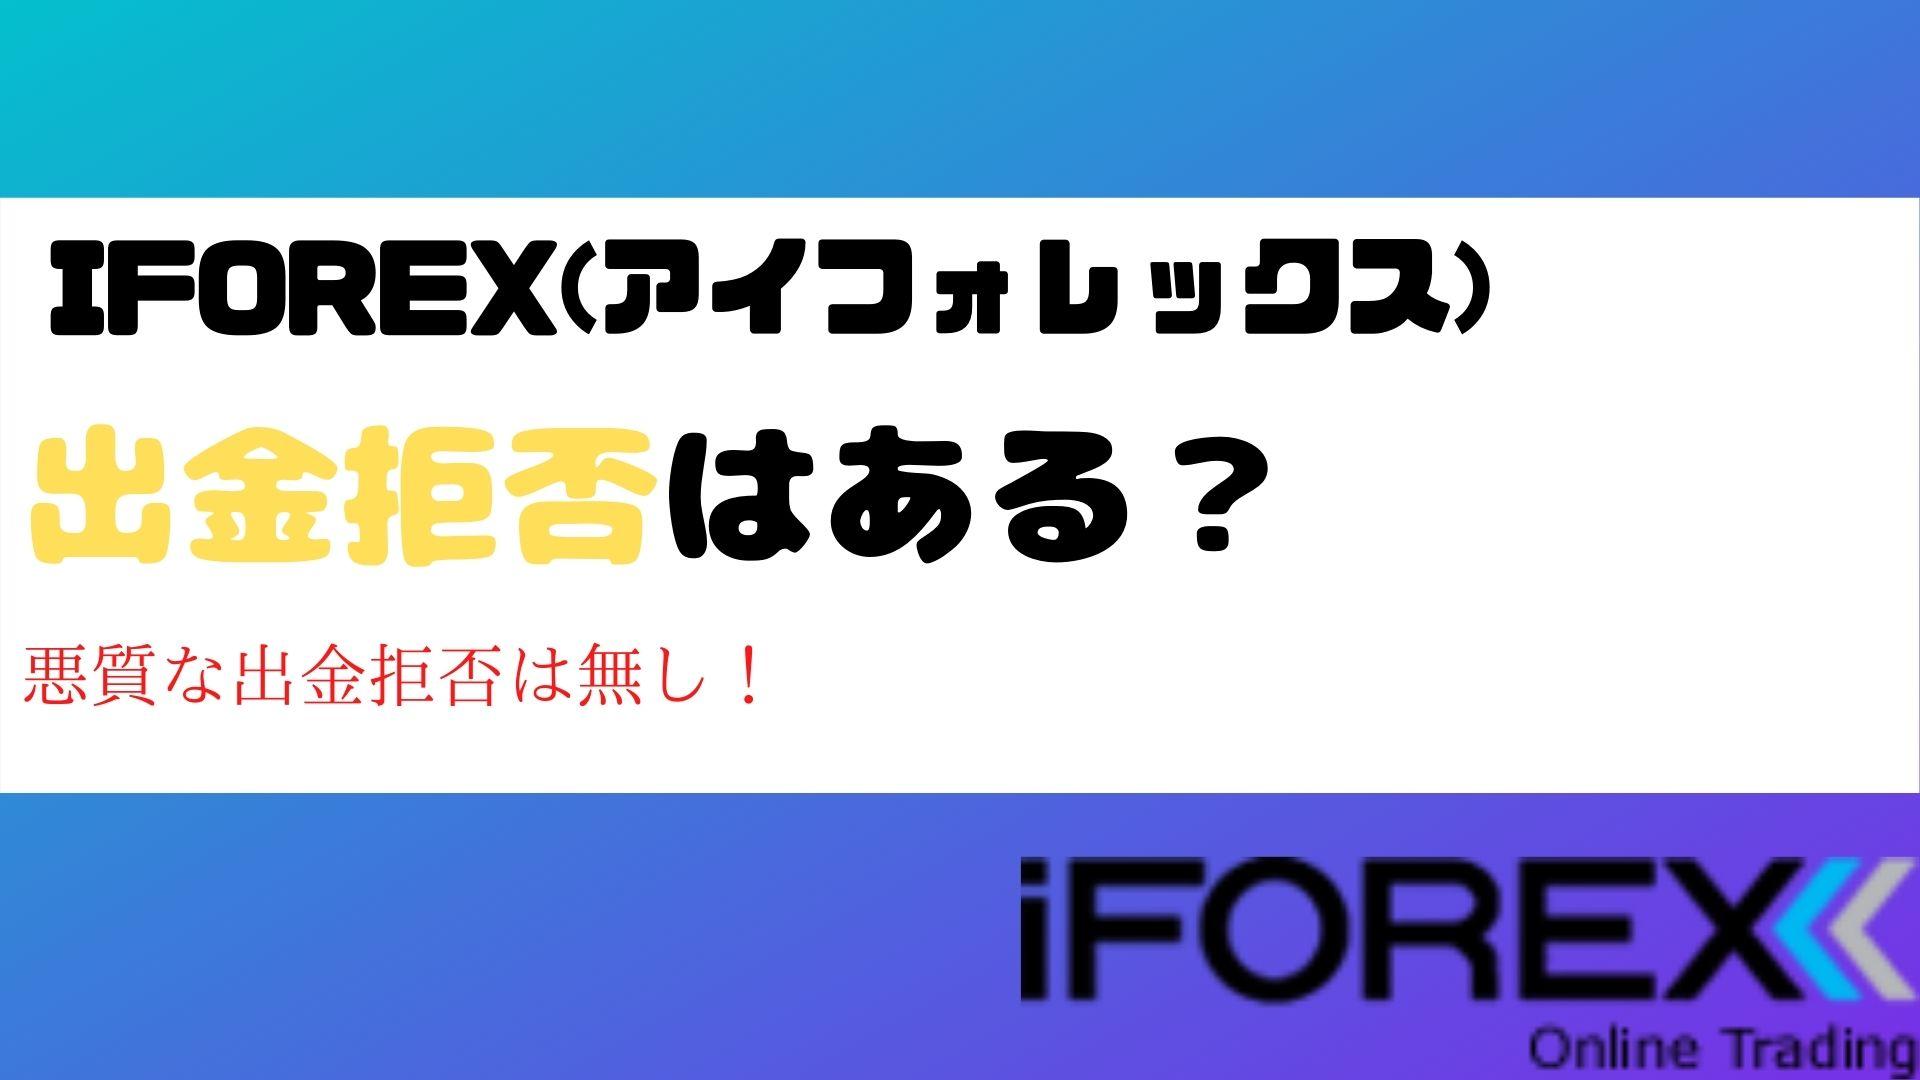 iforex-syukkinkyohi-title